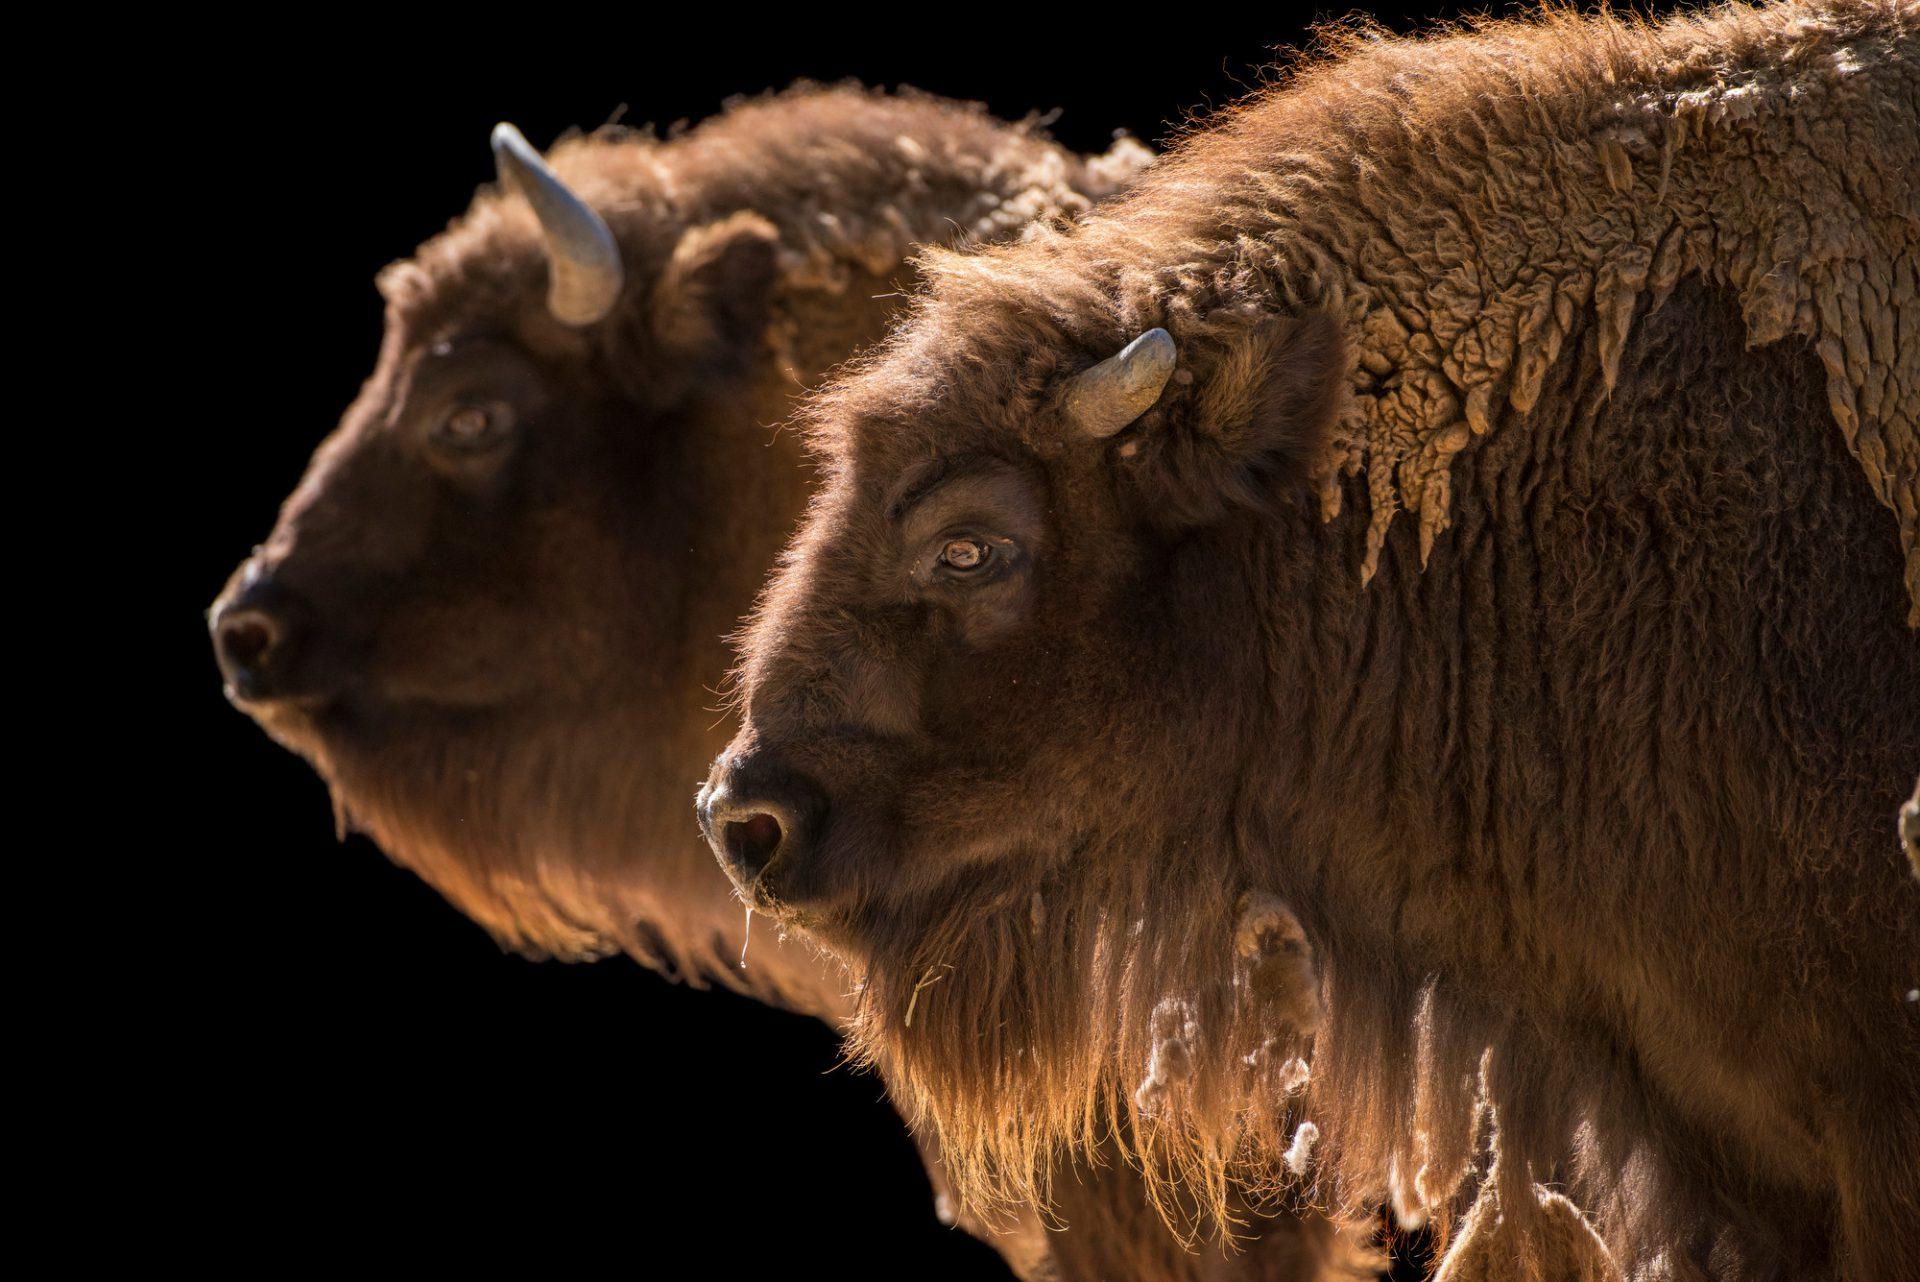 Photo: Vulnerable European wisent (Bison bonasus) at the Madrid Zoo.